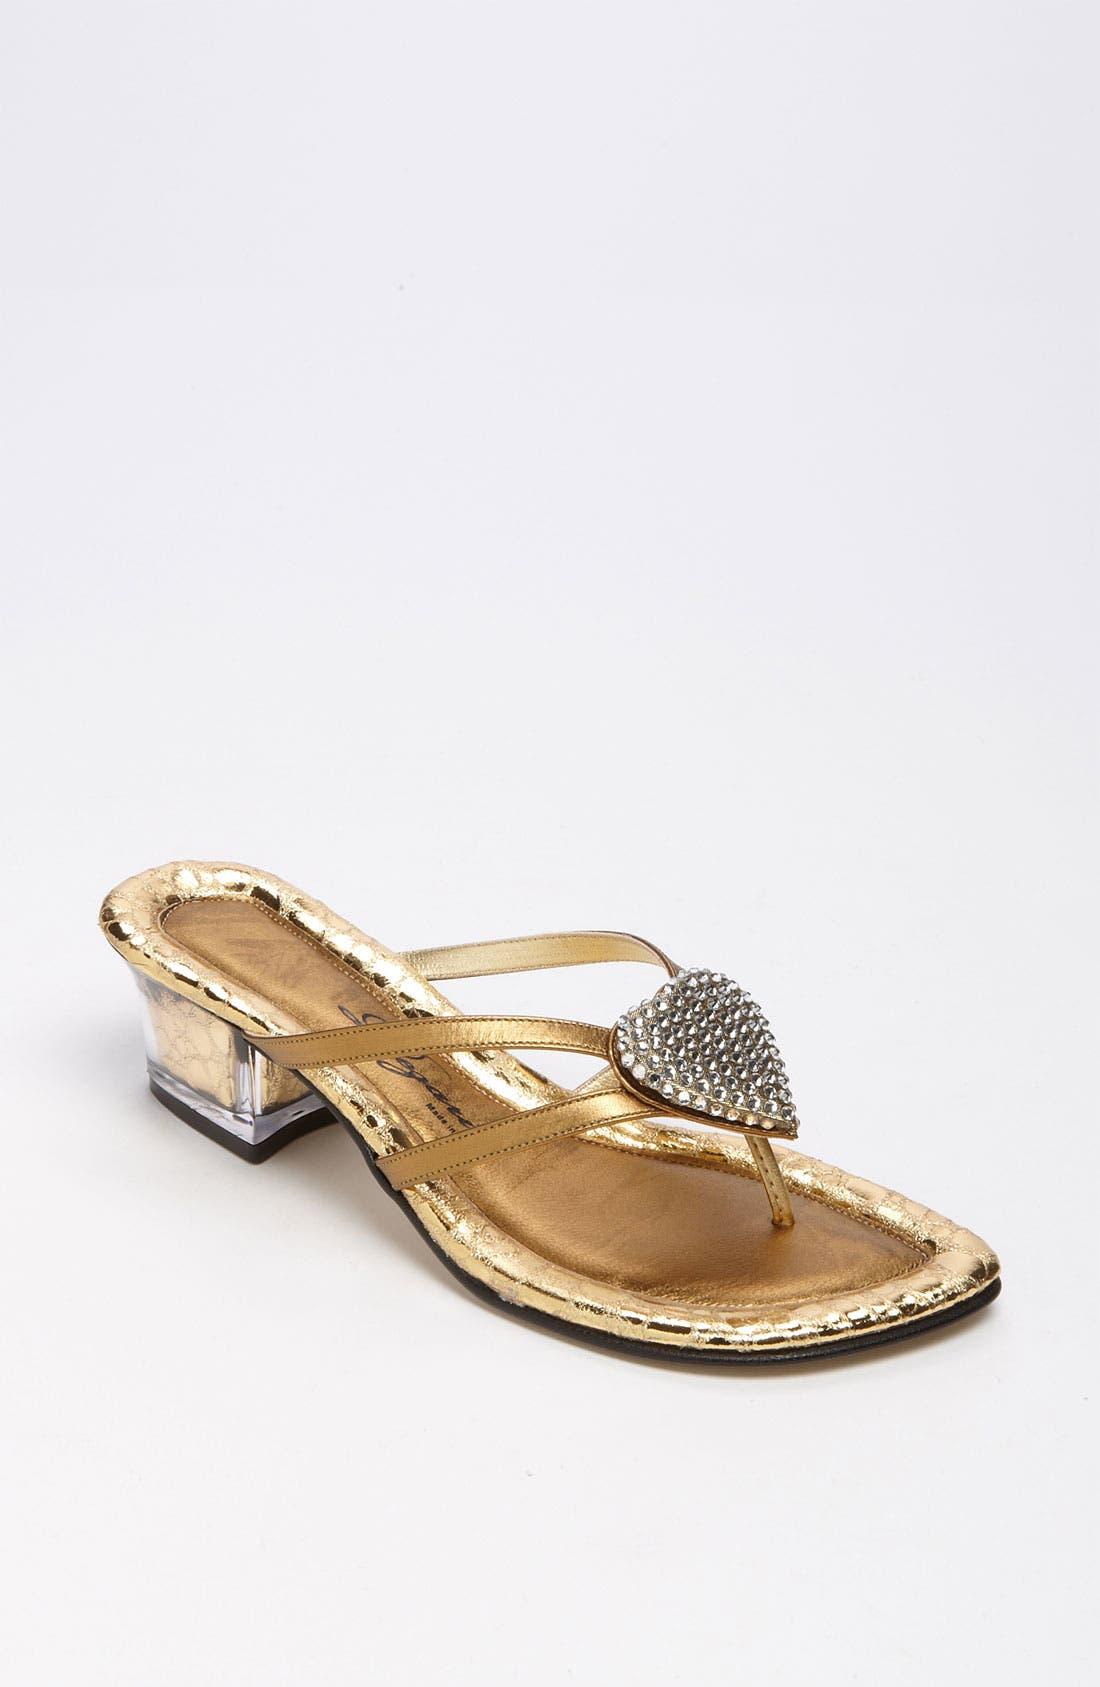 Alternate Image 1 Selected - Dezario 'Desire' Sandal